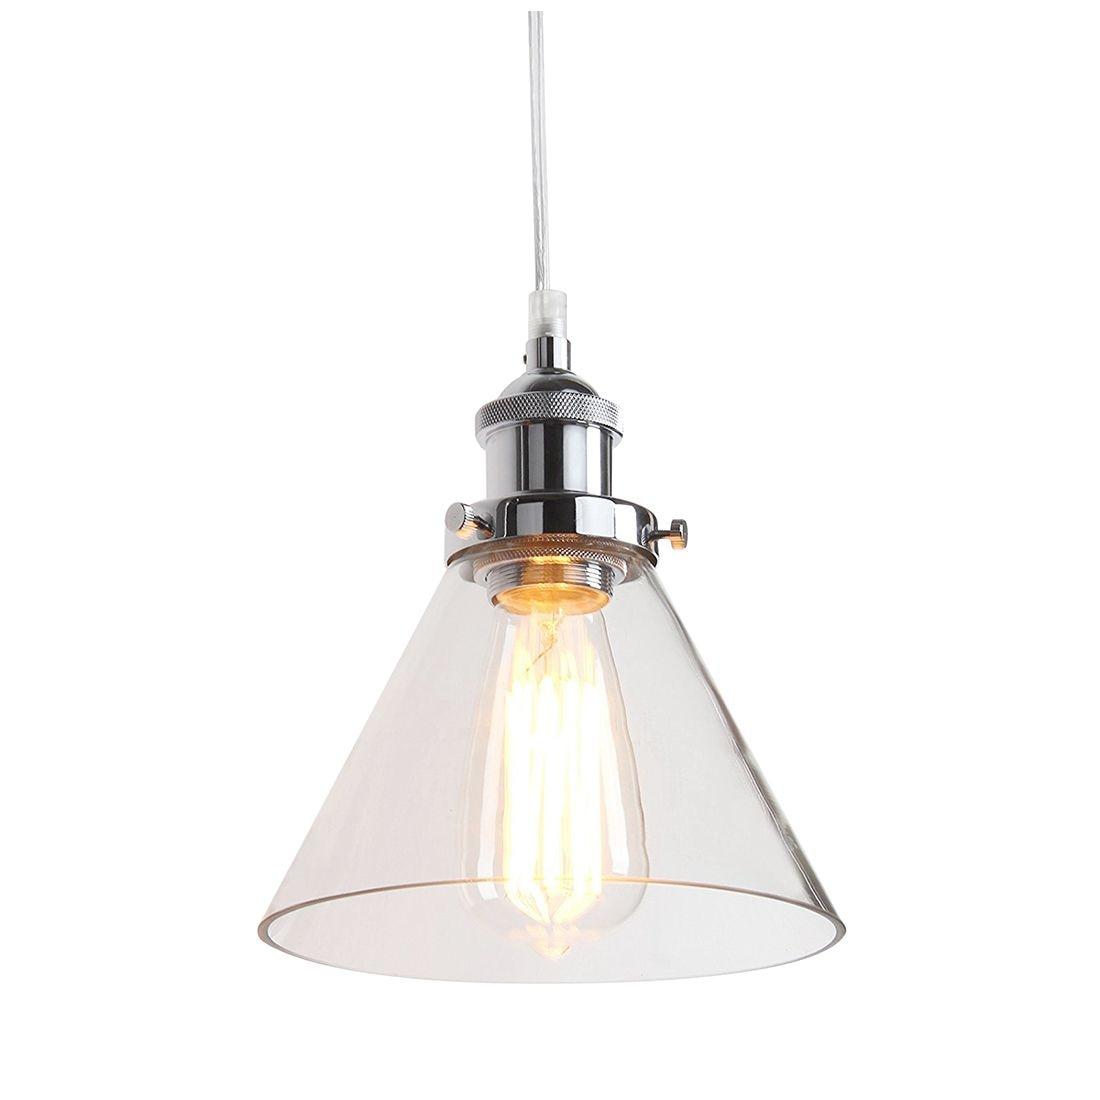 Industrial Kitchen Pendant Lights Popular Industrial Kitchen Lighting Buy Cheap Industrial Kitchen